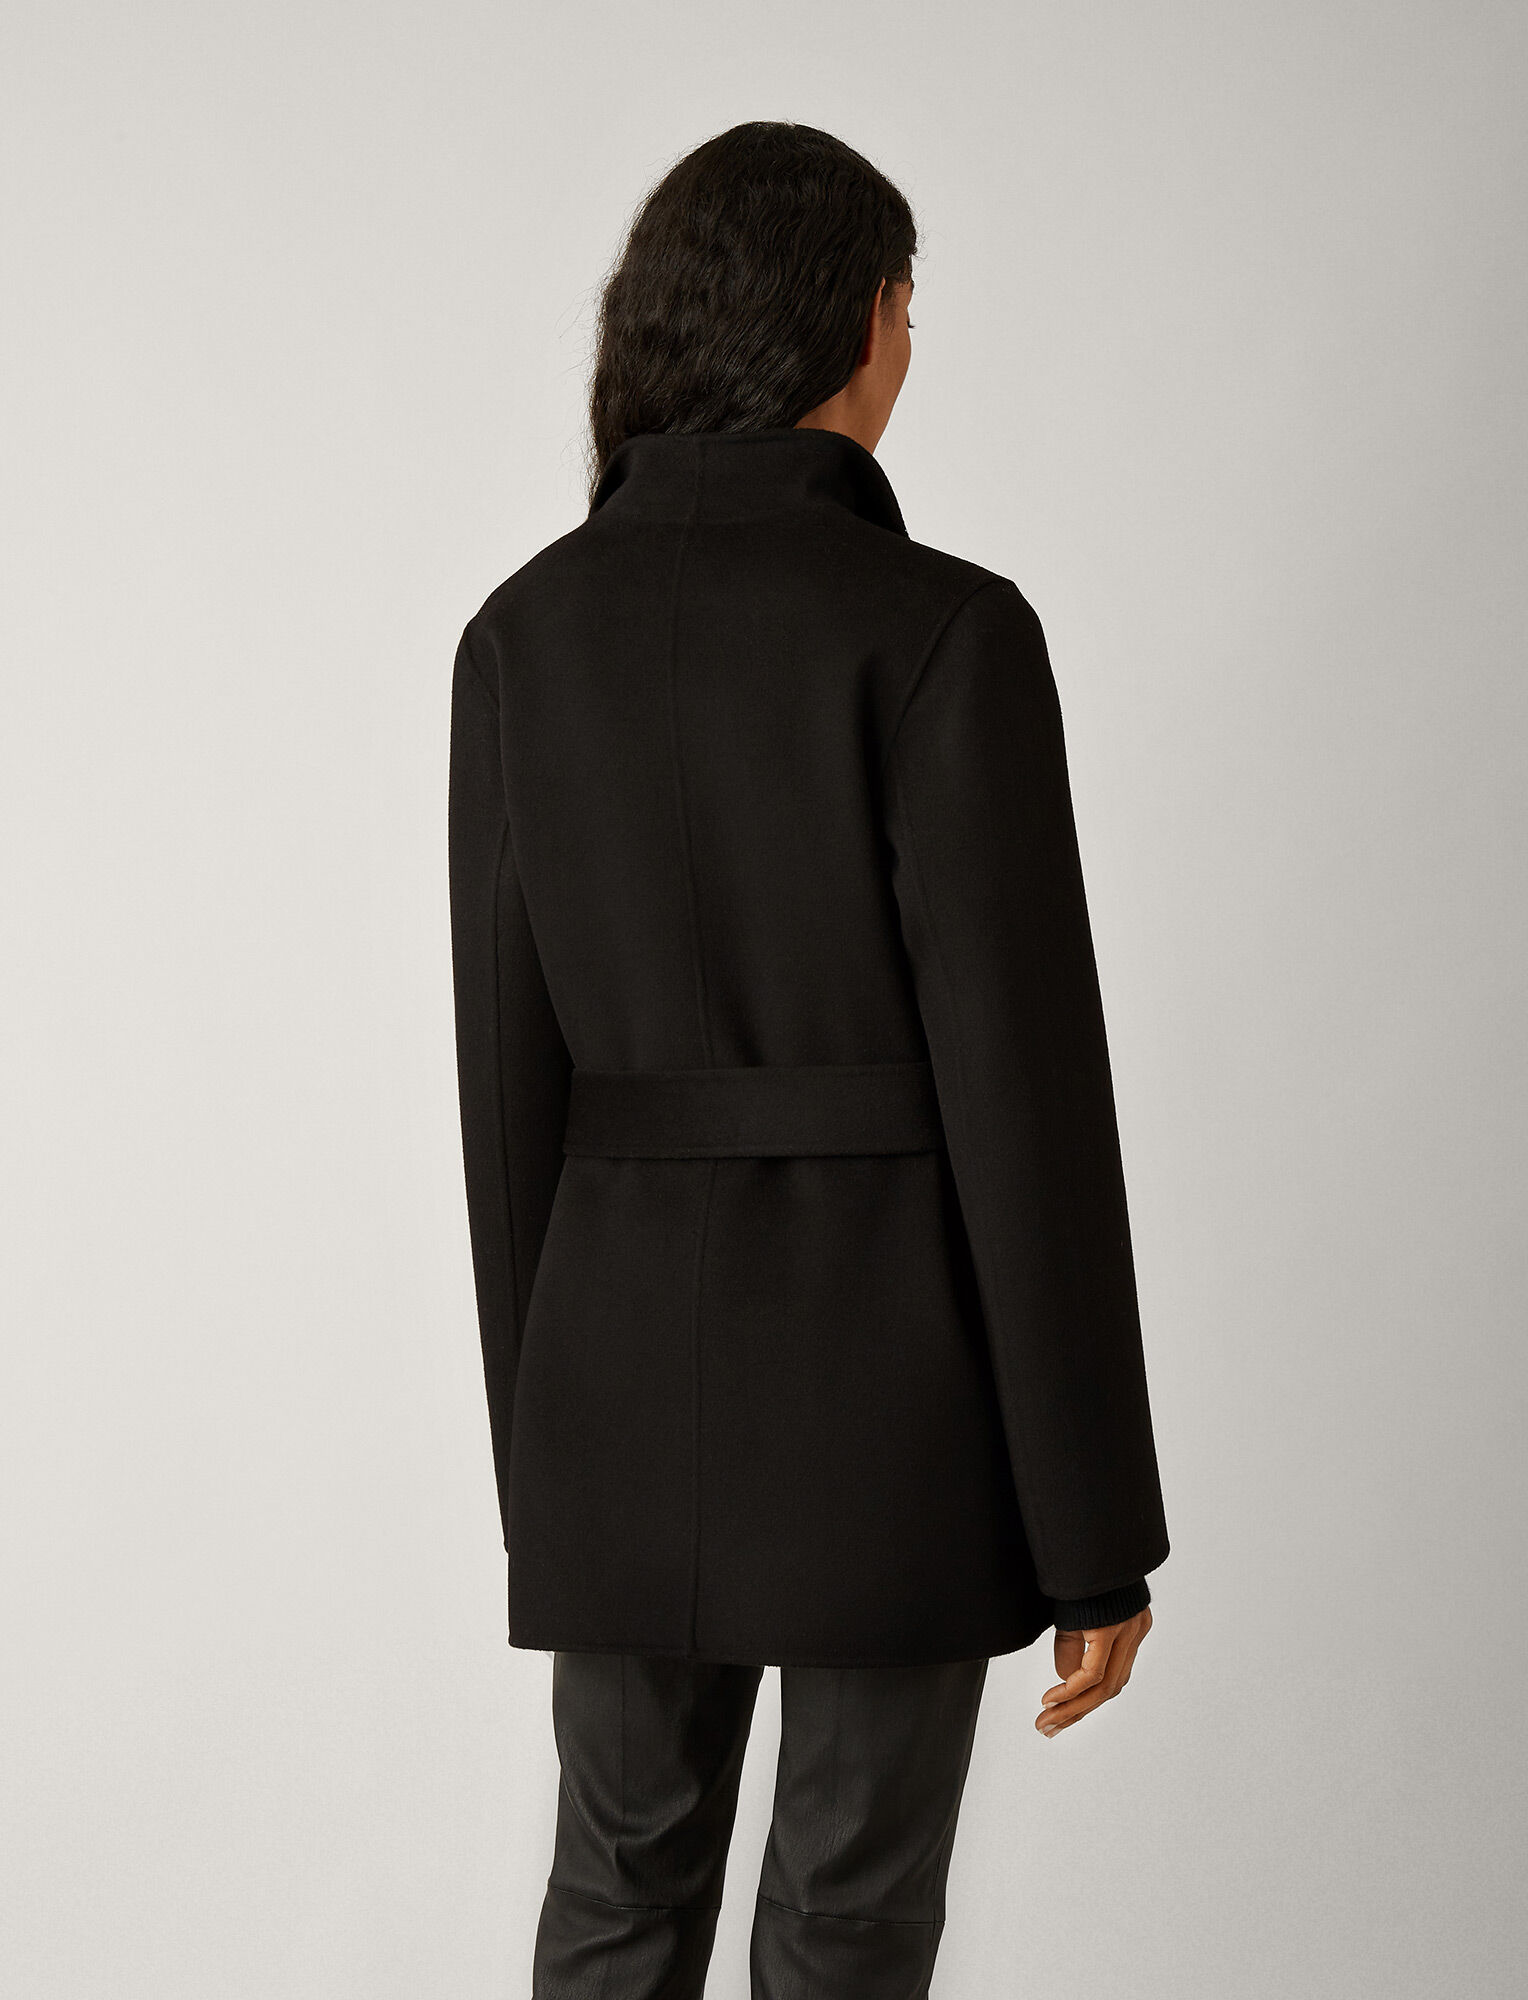 Joseph, Lima Short Double Face Cashmere Coat, in BLACK